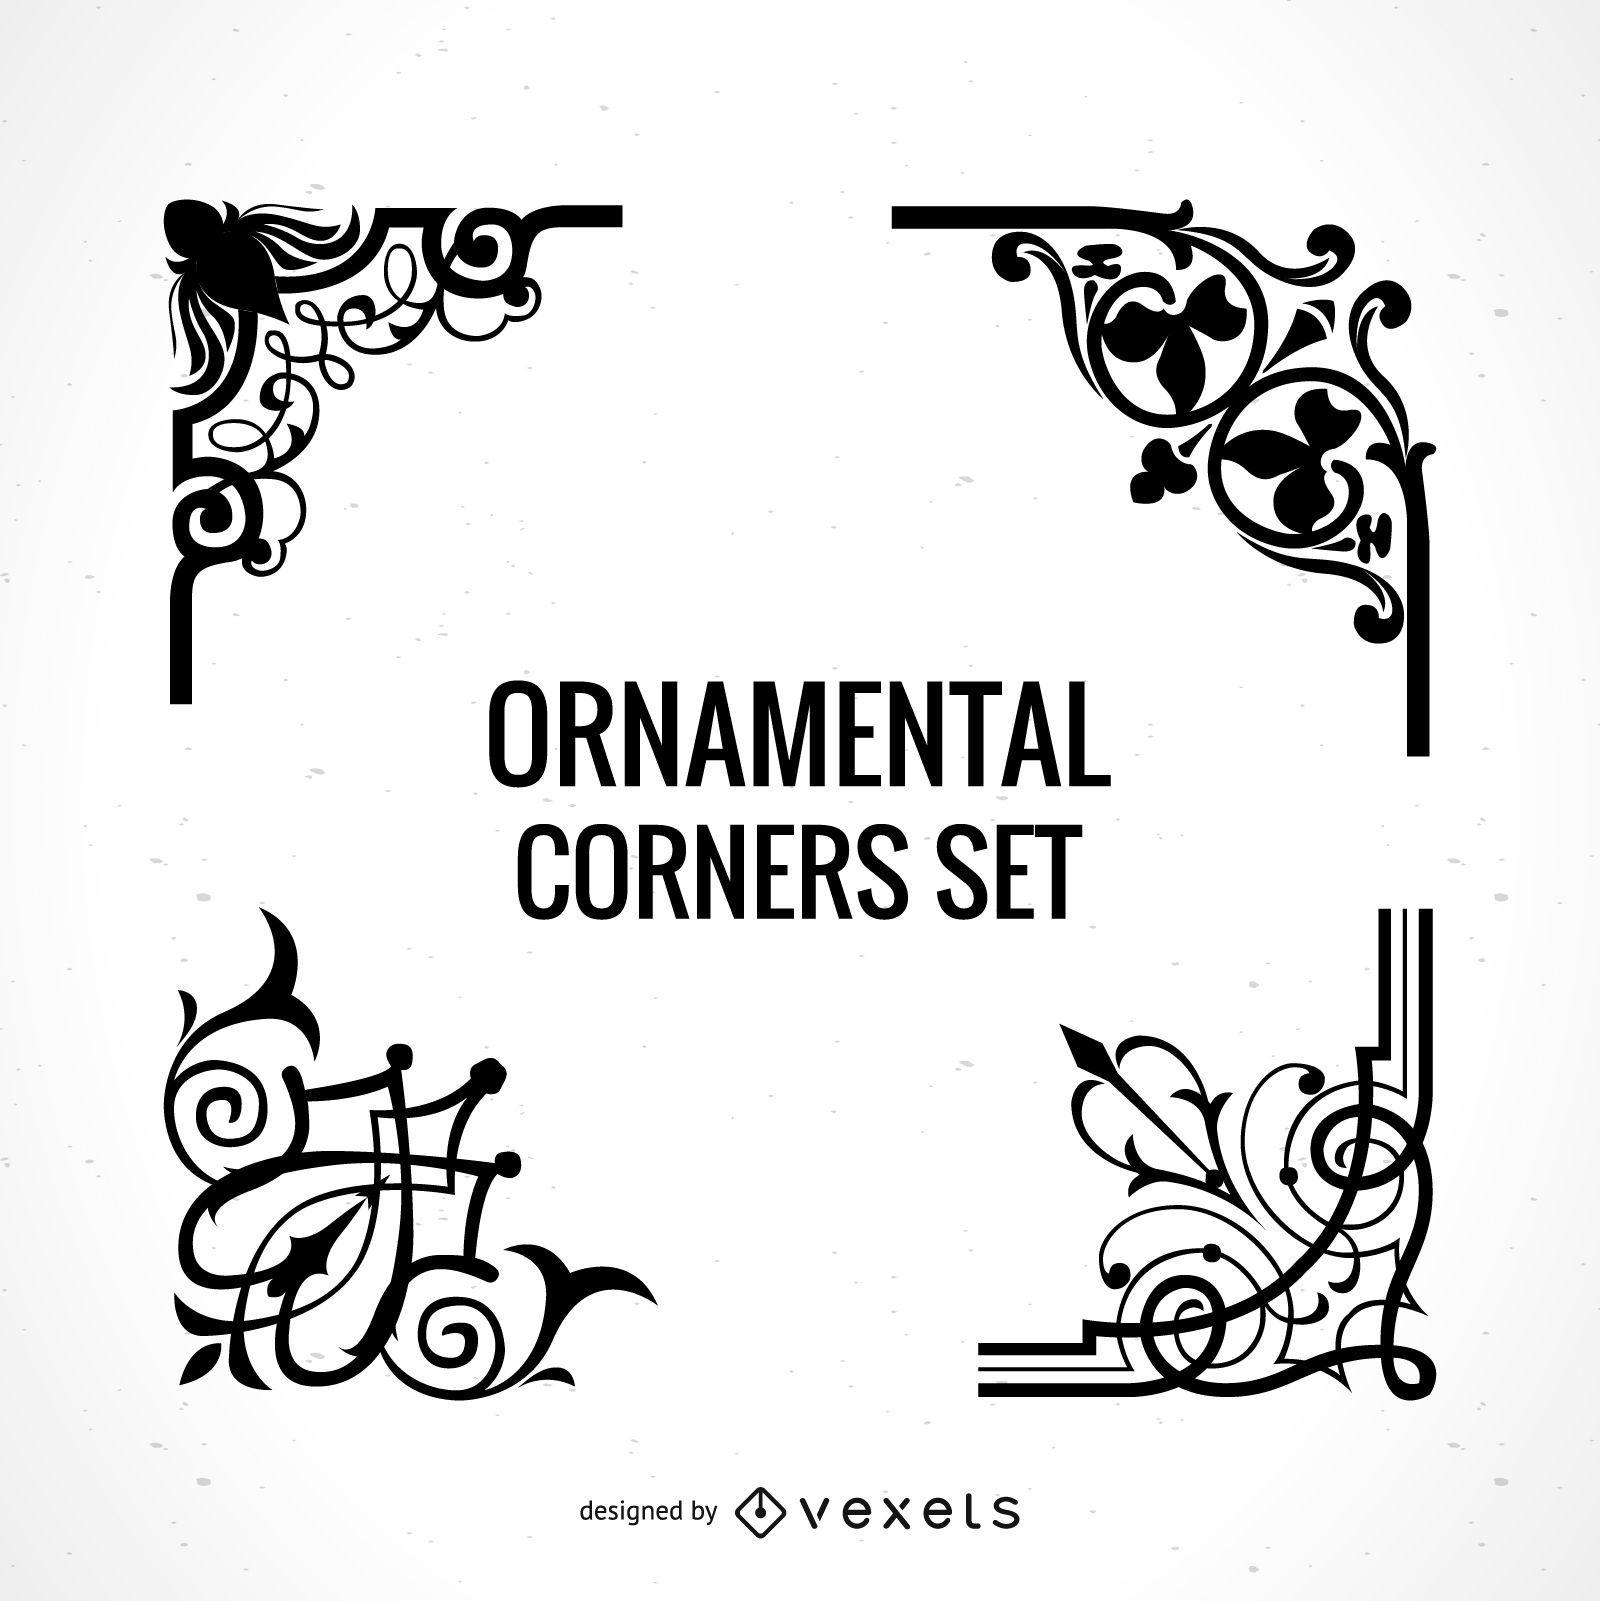 Ornamental corners set